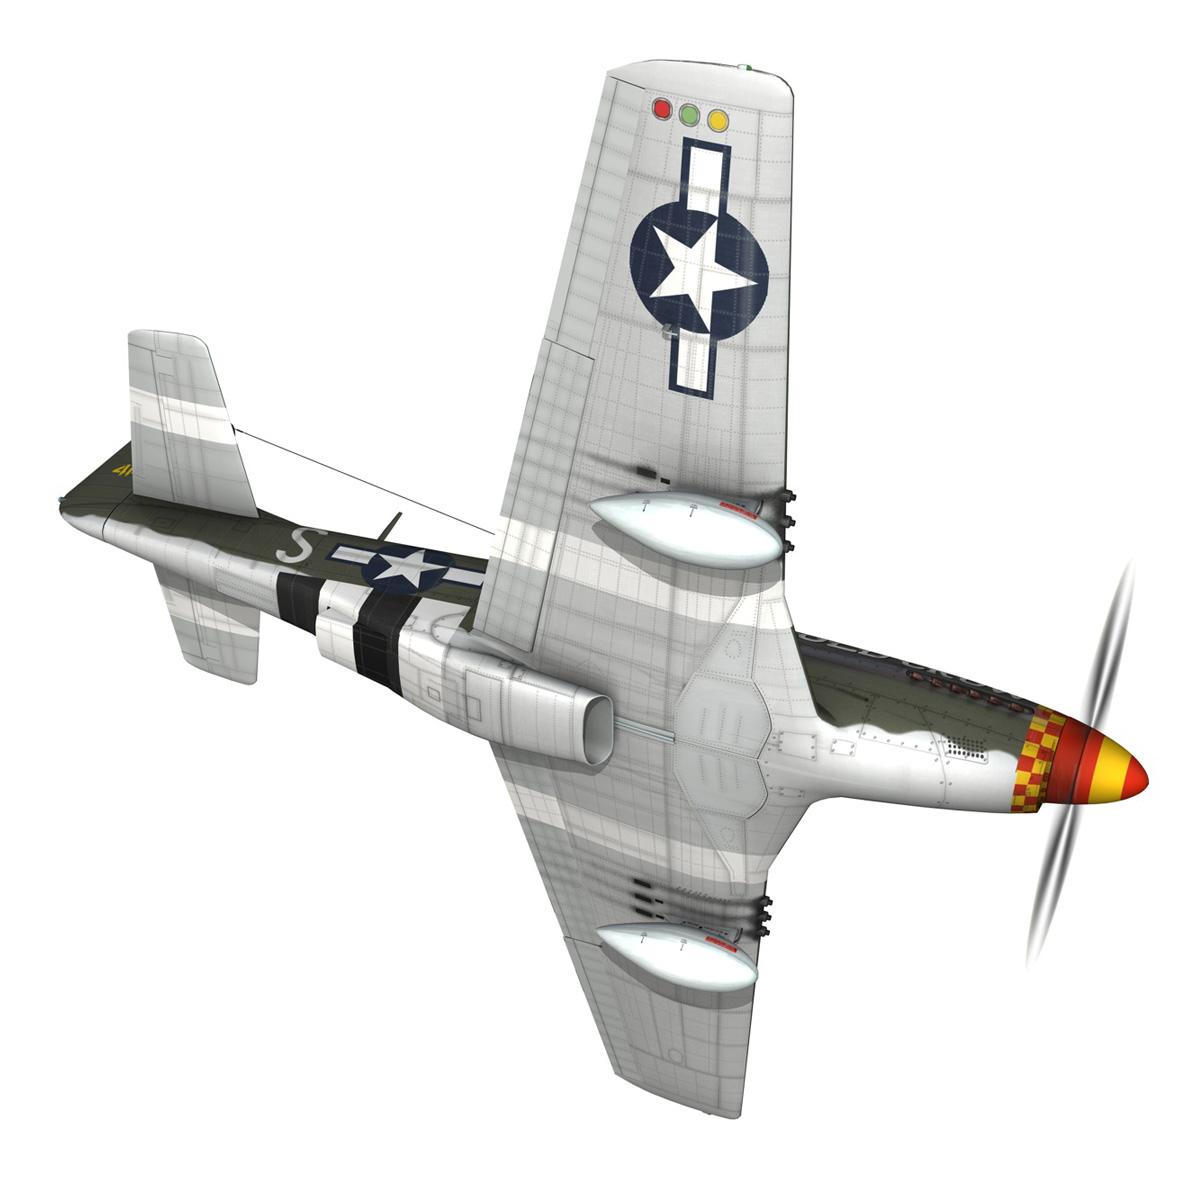 north american p-51d mustang – old crow 3d model fbx c4d lwo obj 273340